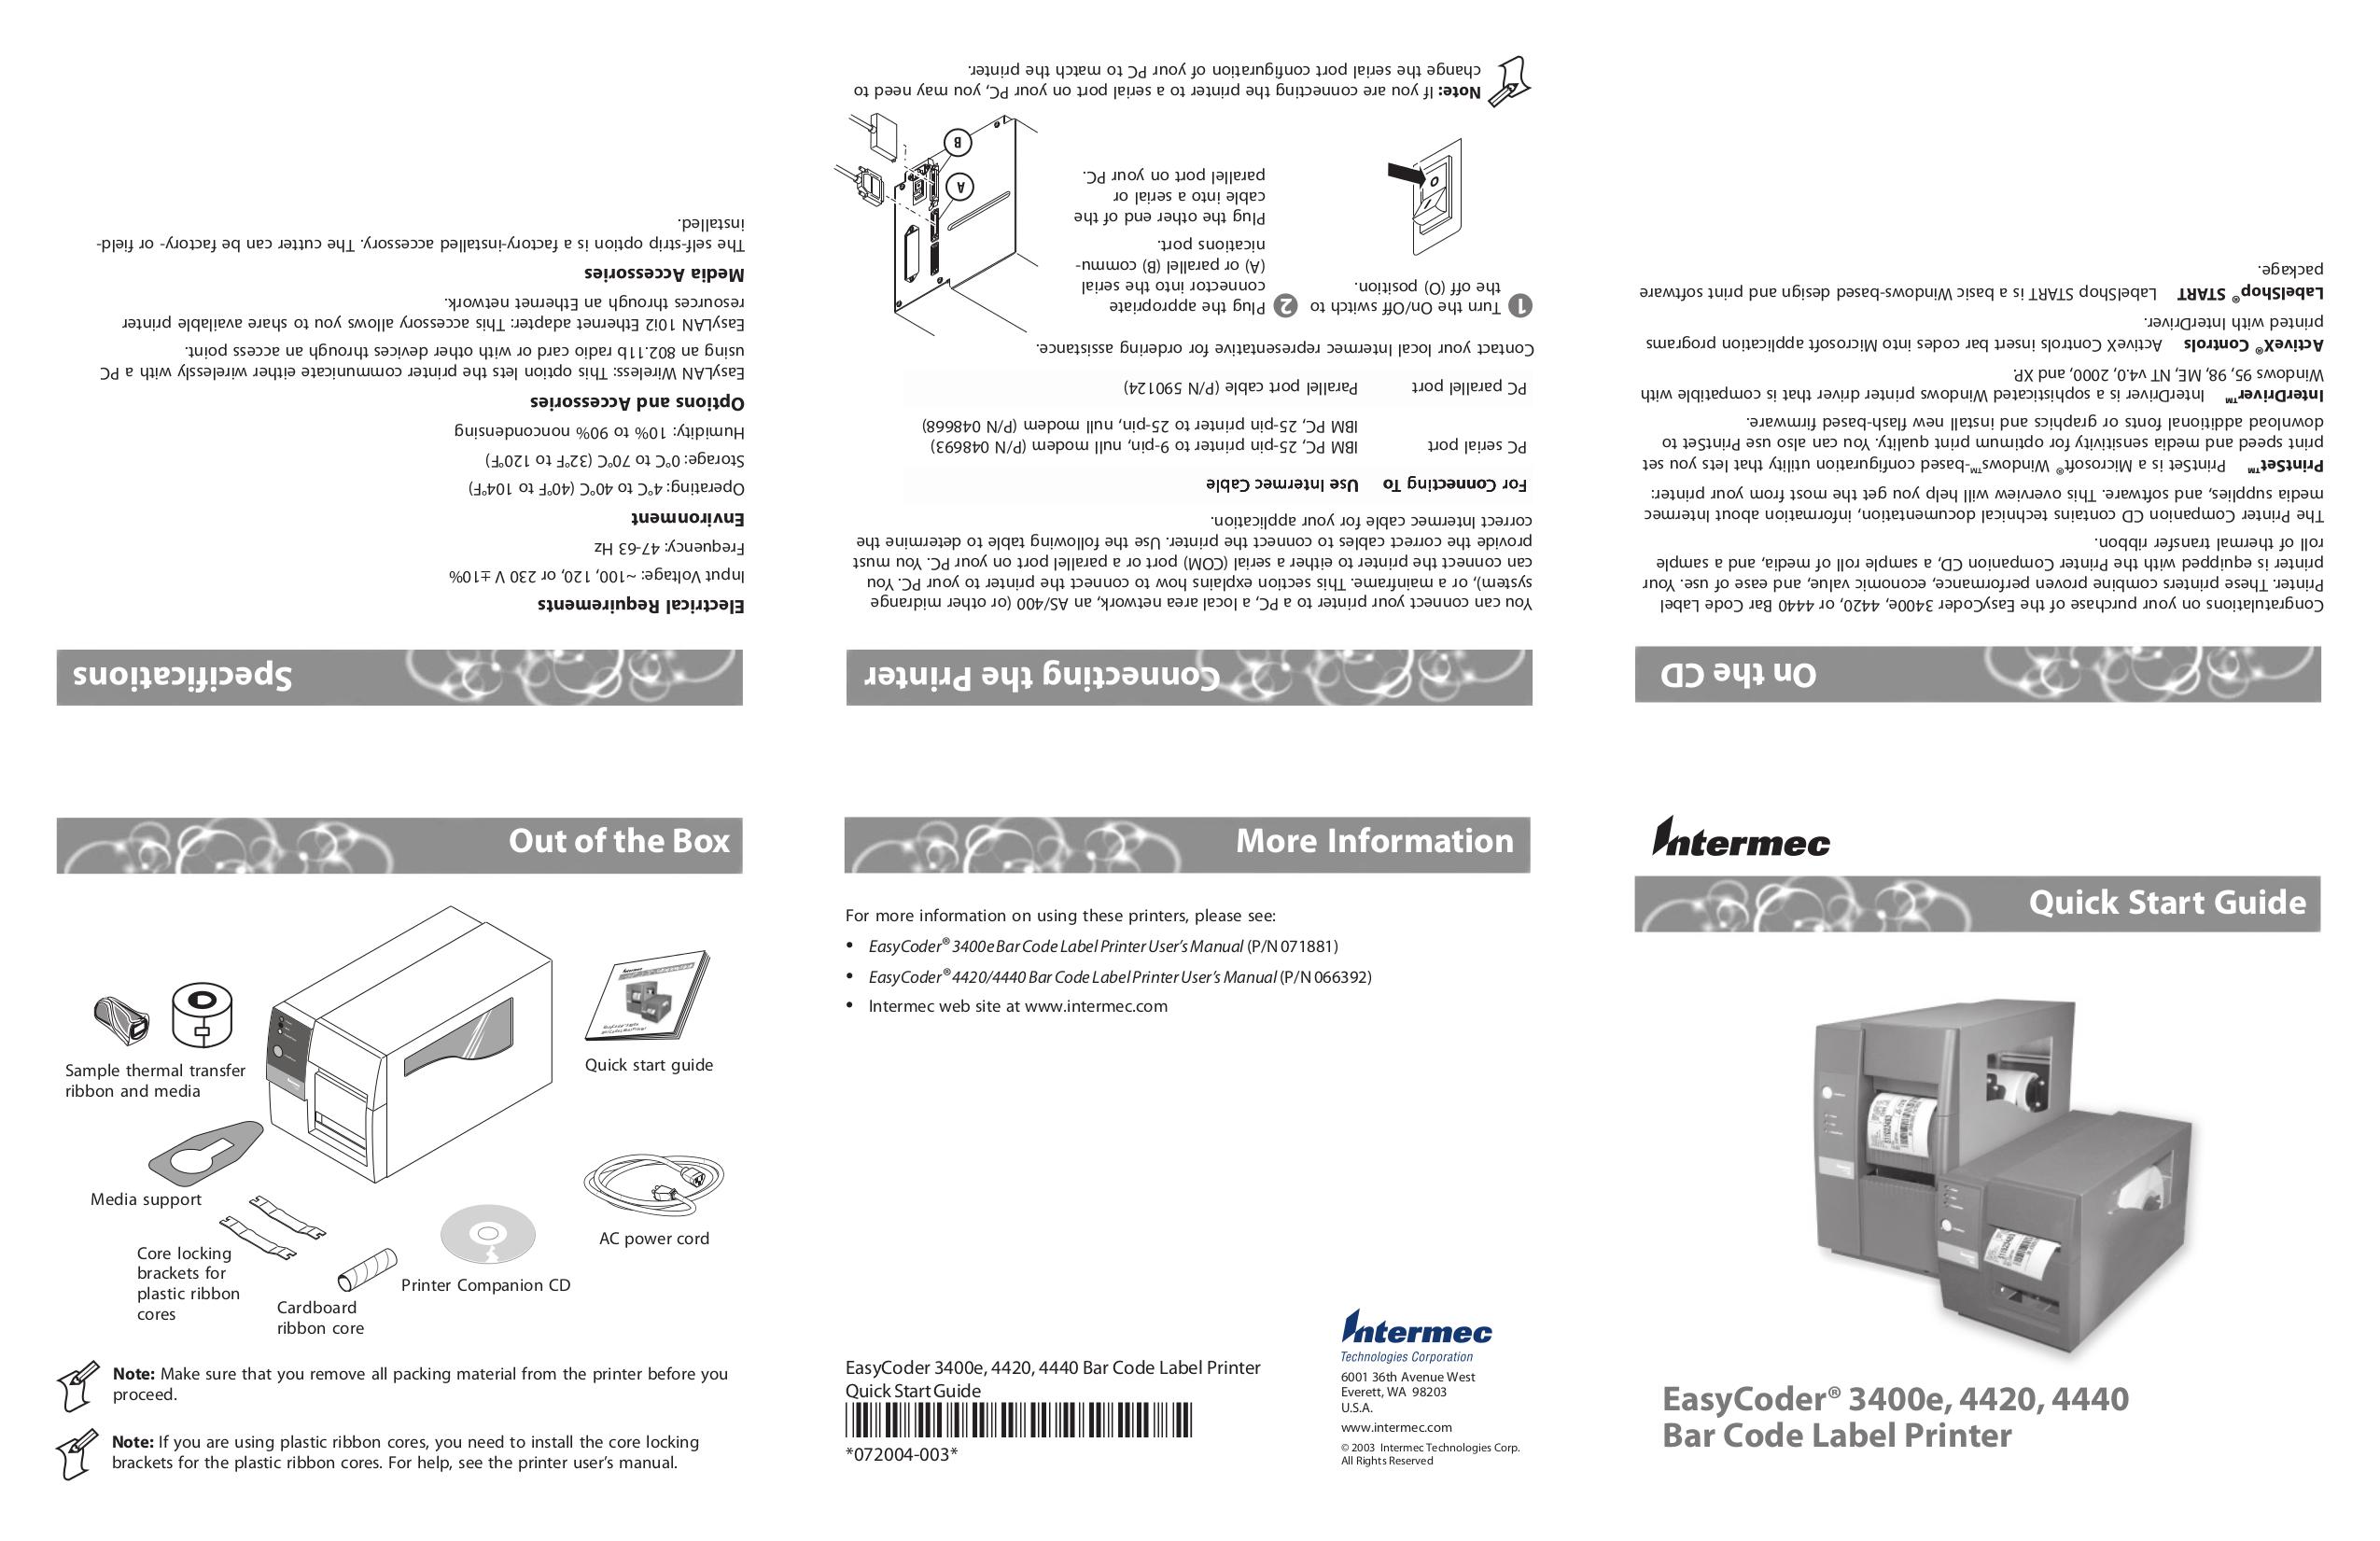 Download free pdf for intermec easycoder 4440 printer manual.